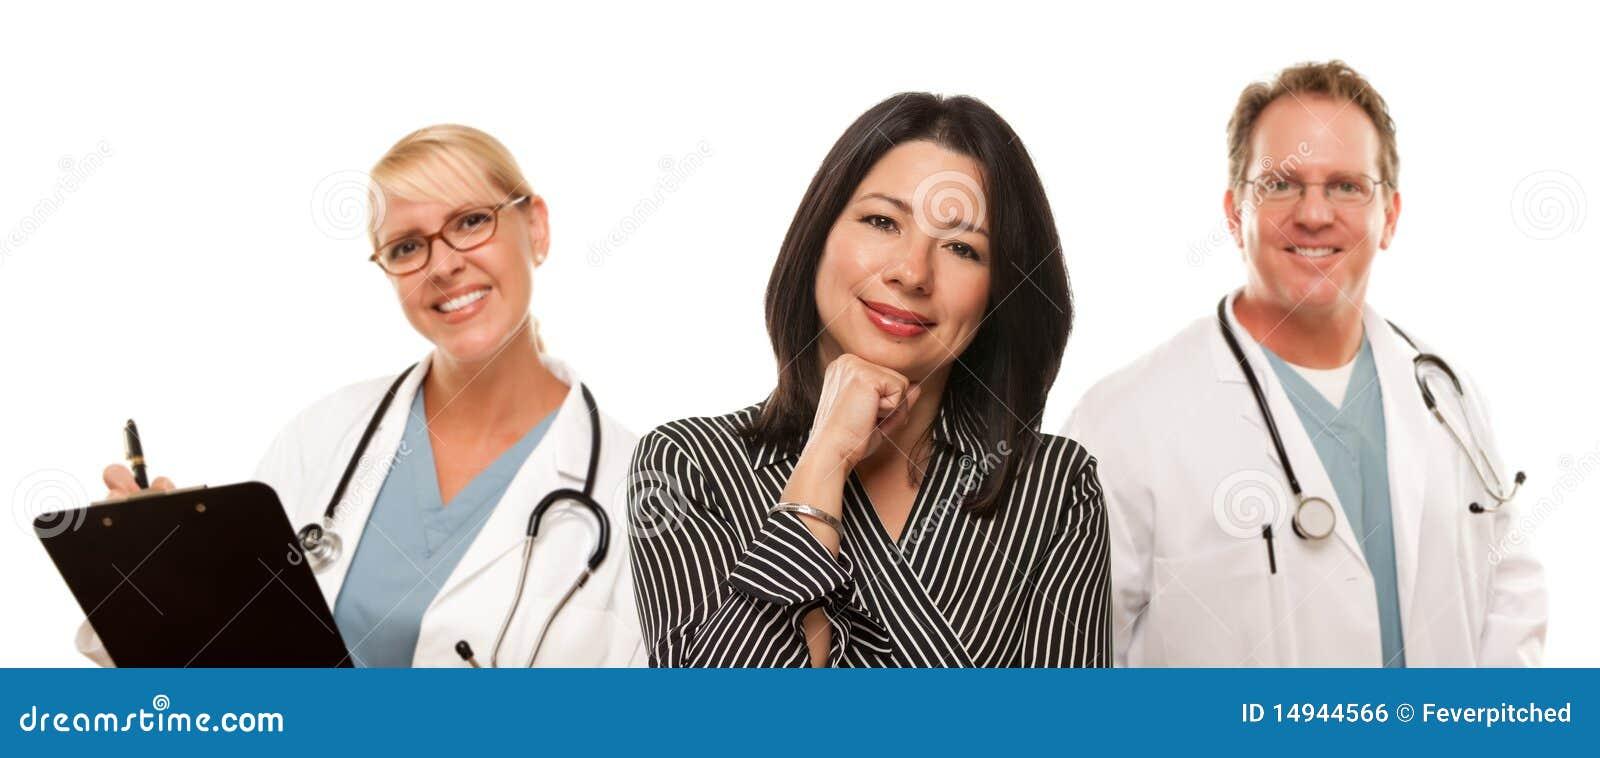 Hispanic Woman with Male Doctor and Nurse